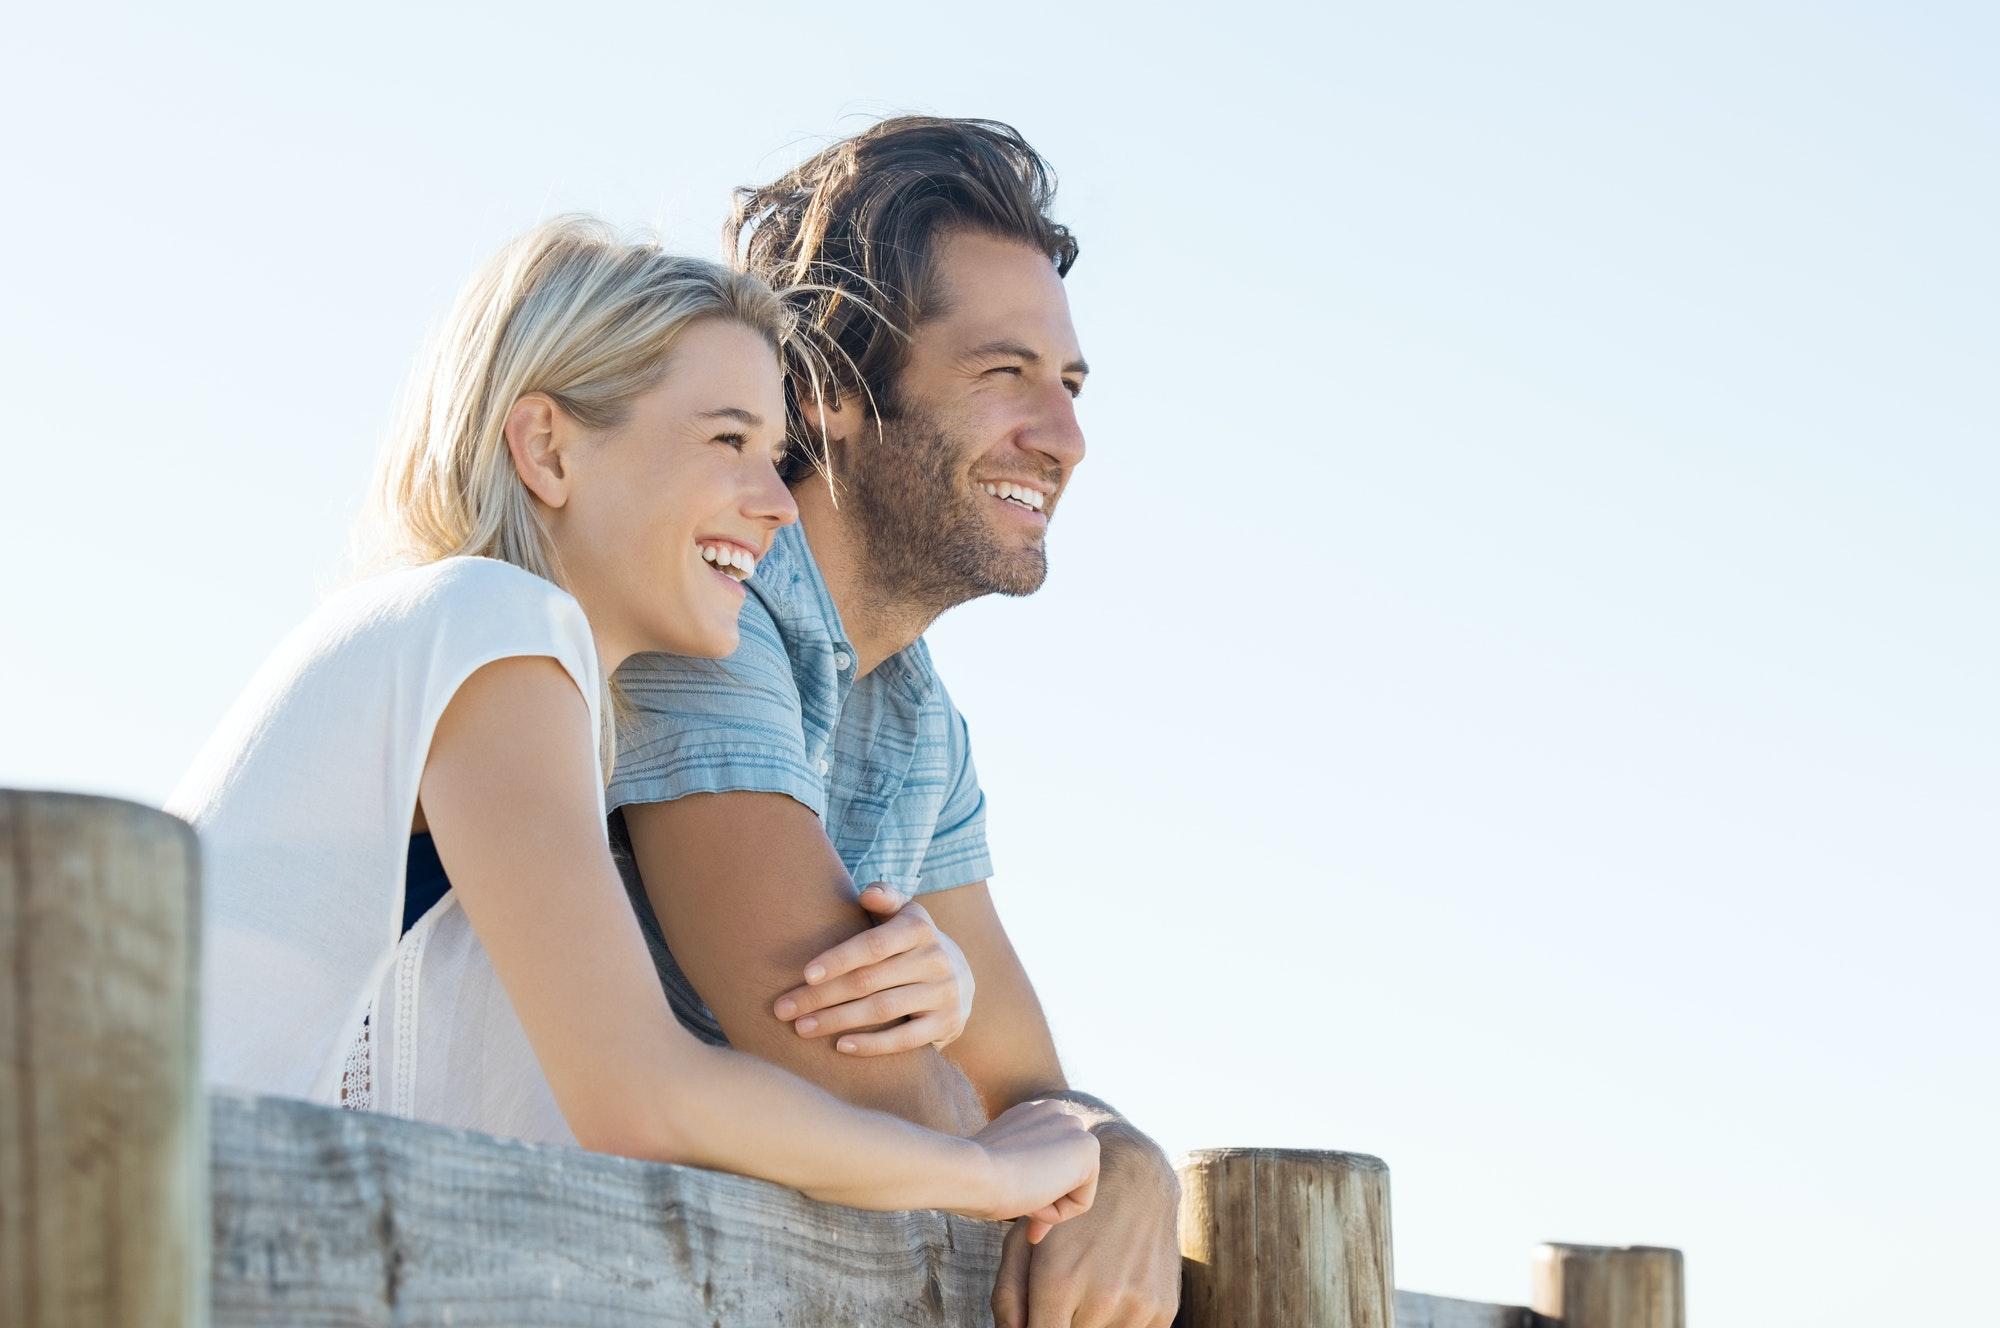 Happy couple vision